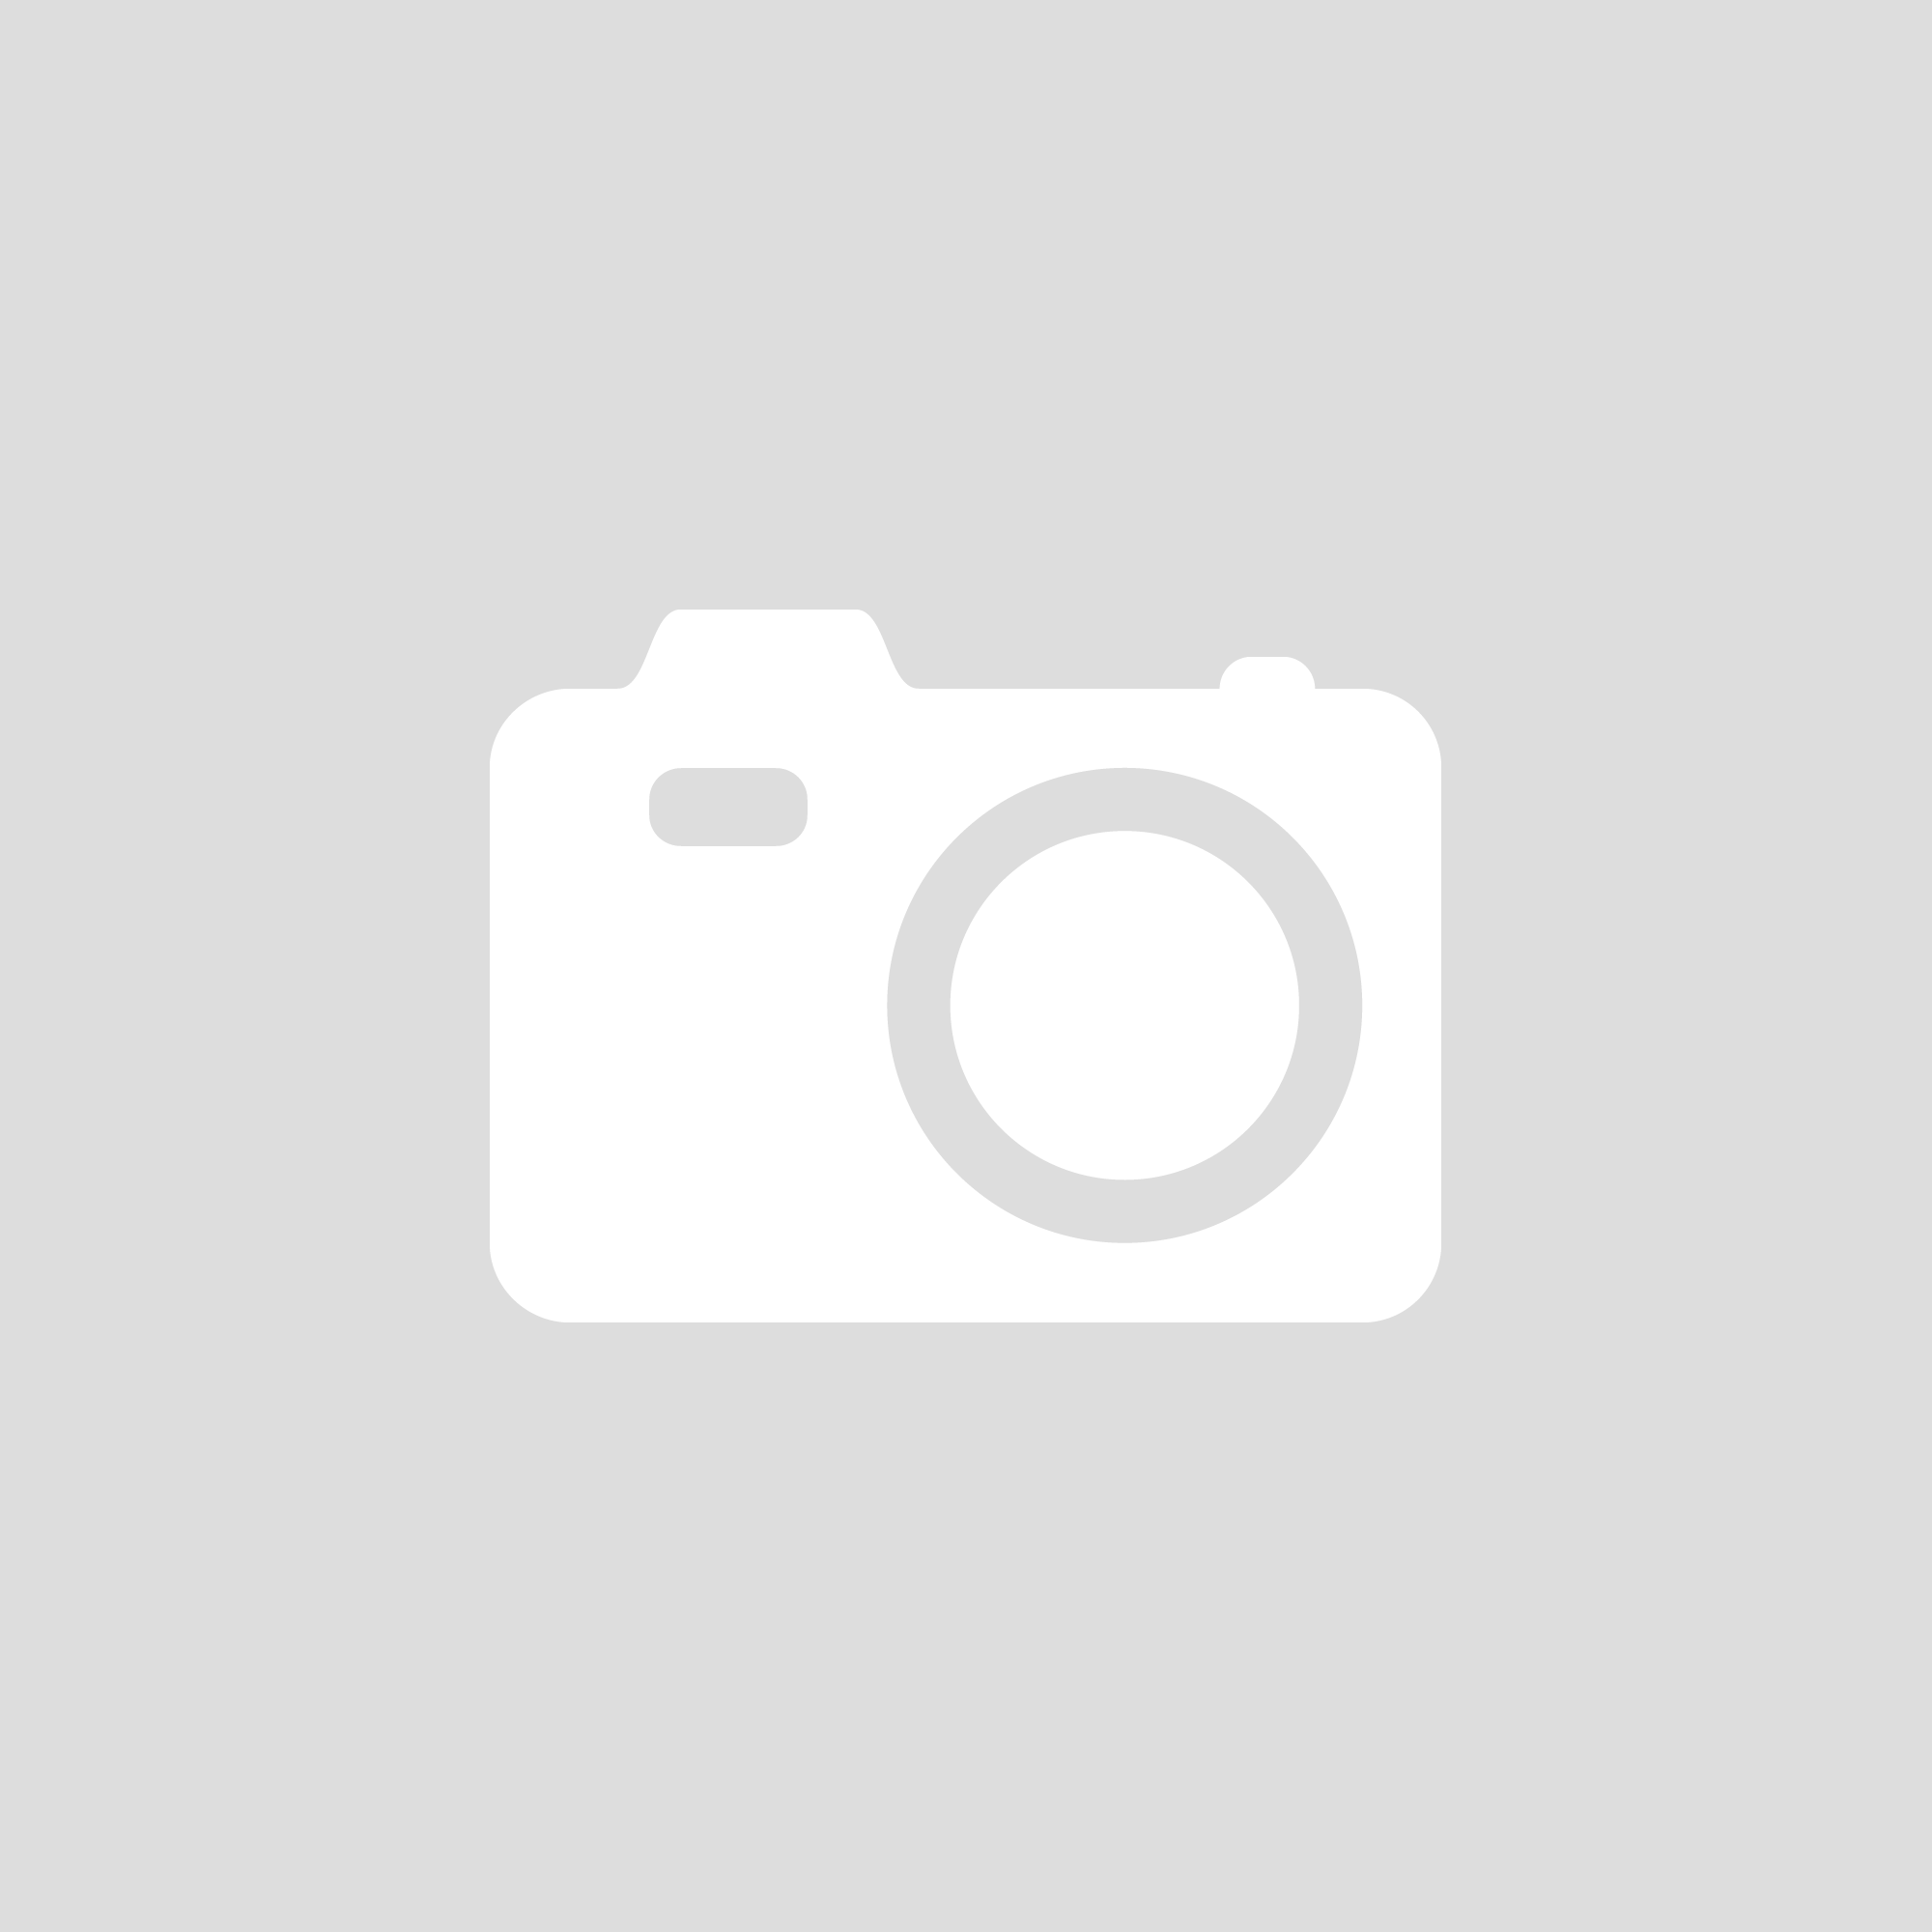 Tiffany Platinum Red / Cream Wallpaper by Belgravia GB 165